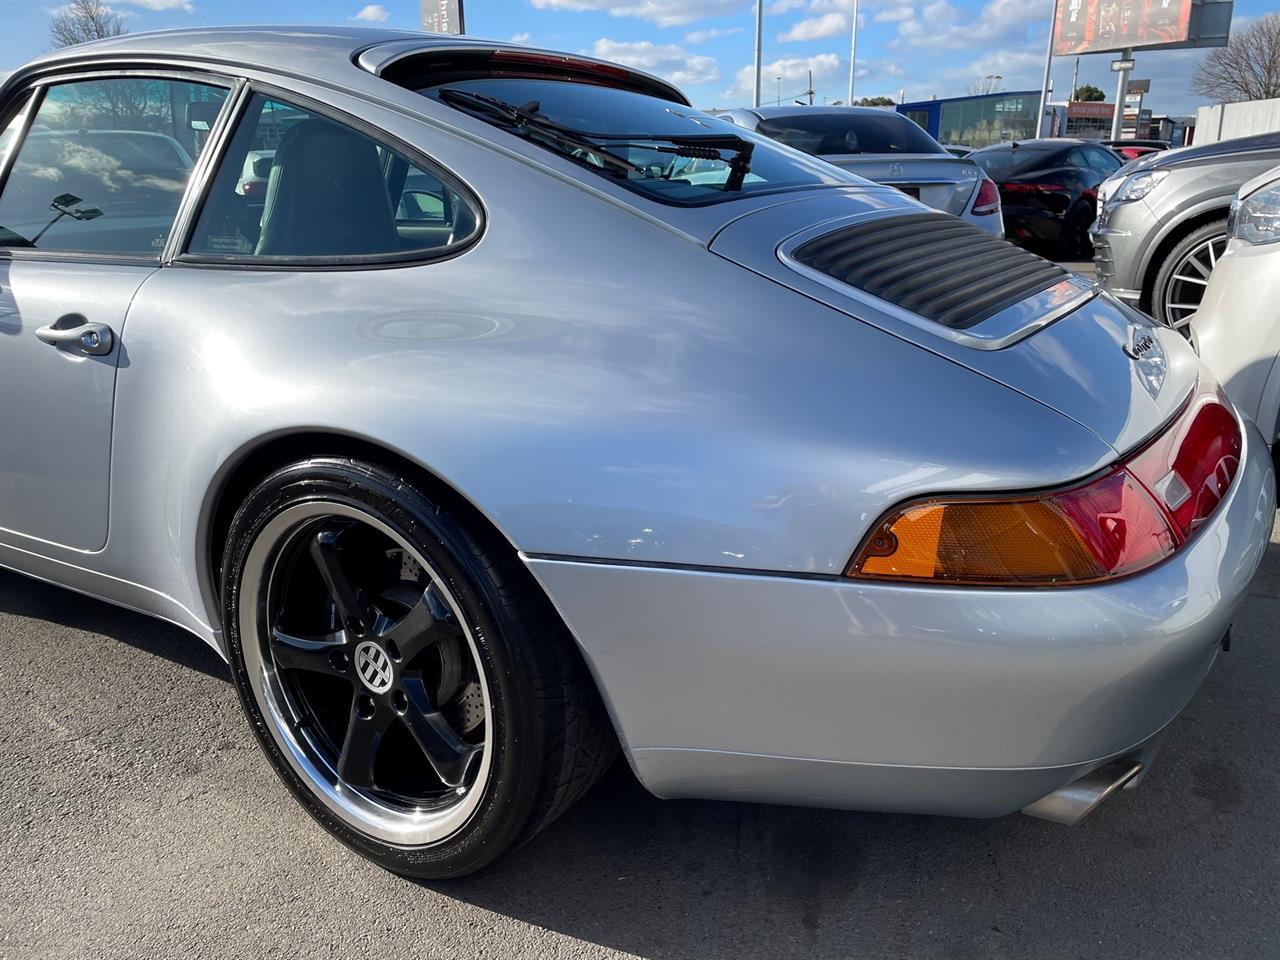 image-4, 1996 Porsche 911 993 Carrera 2 at Christchurch